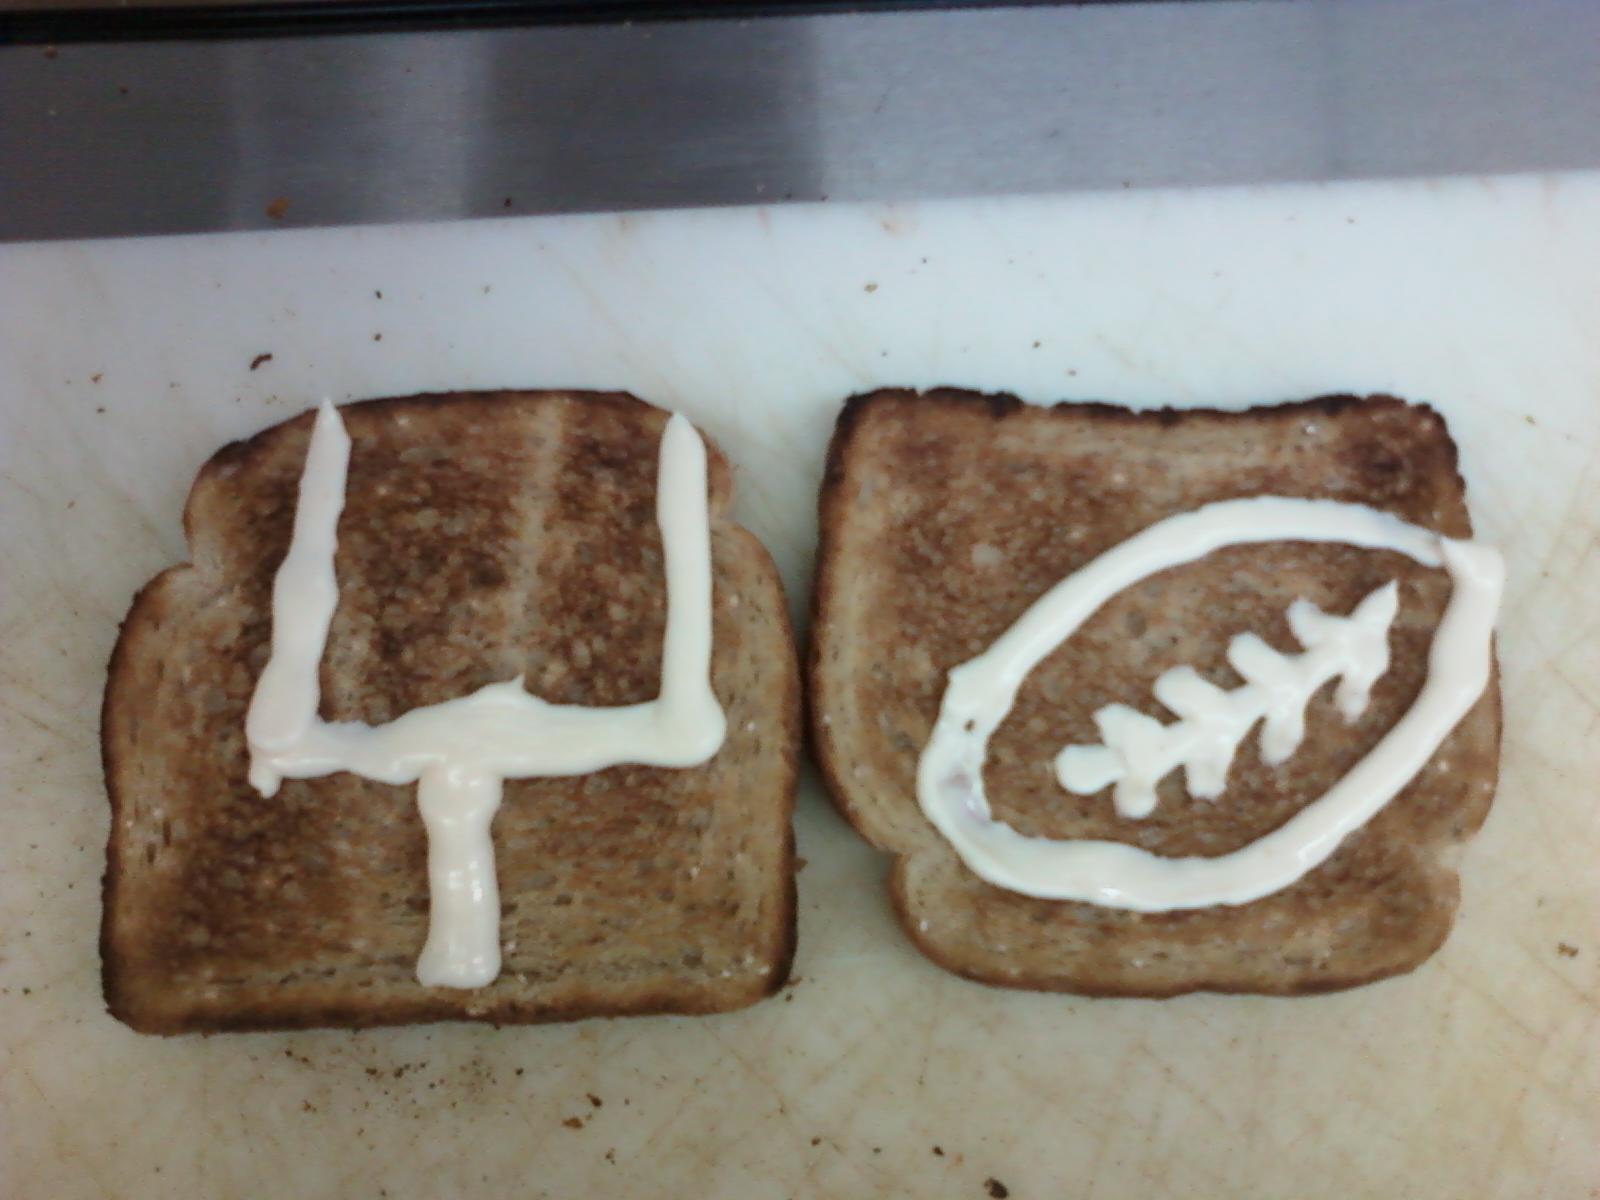 sandwich_art/0813110952.jpg